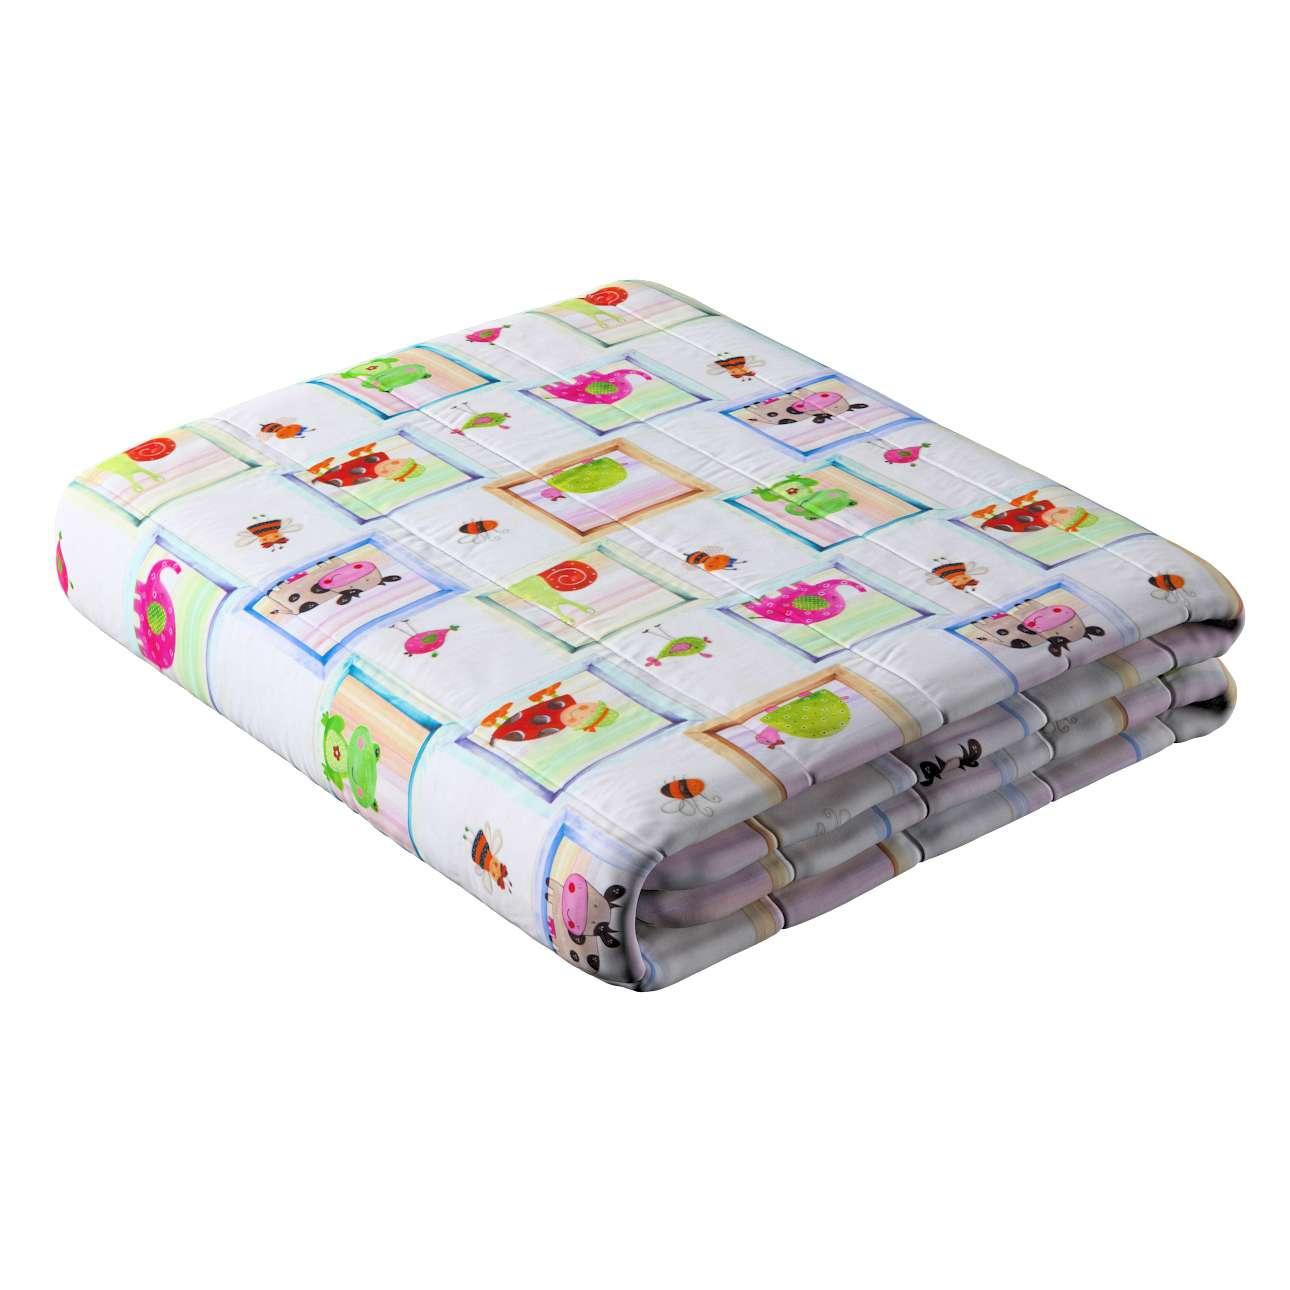 Narzuta pikowana w pasy w kolekcji Apanona do -50%, tkanina: 151-04